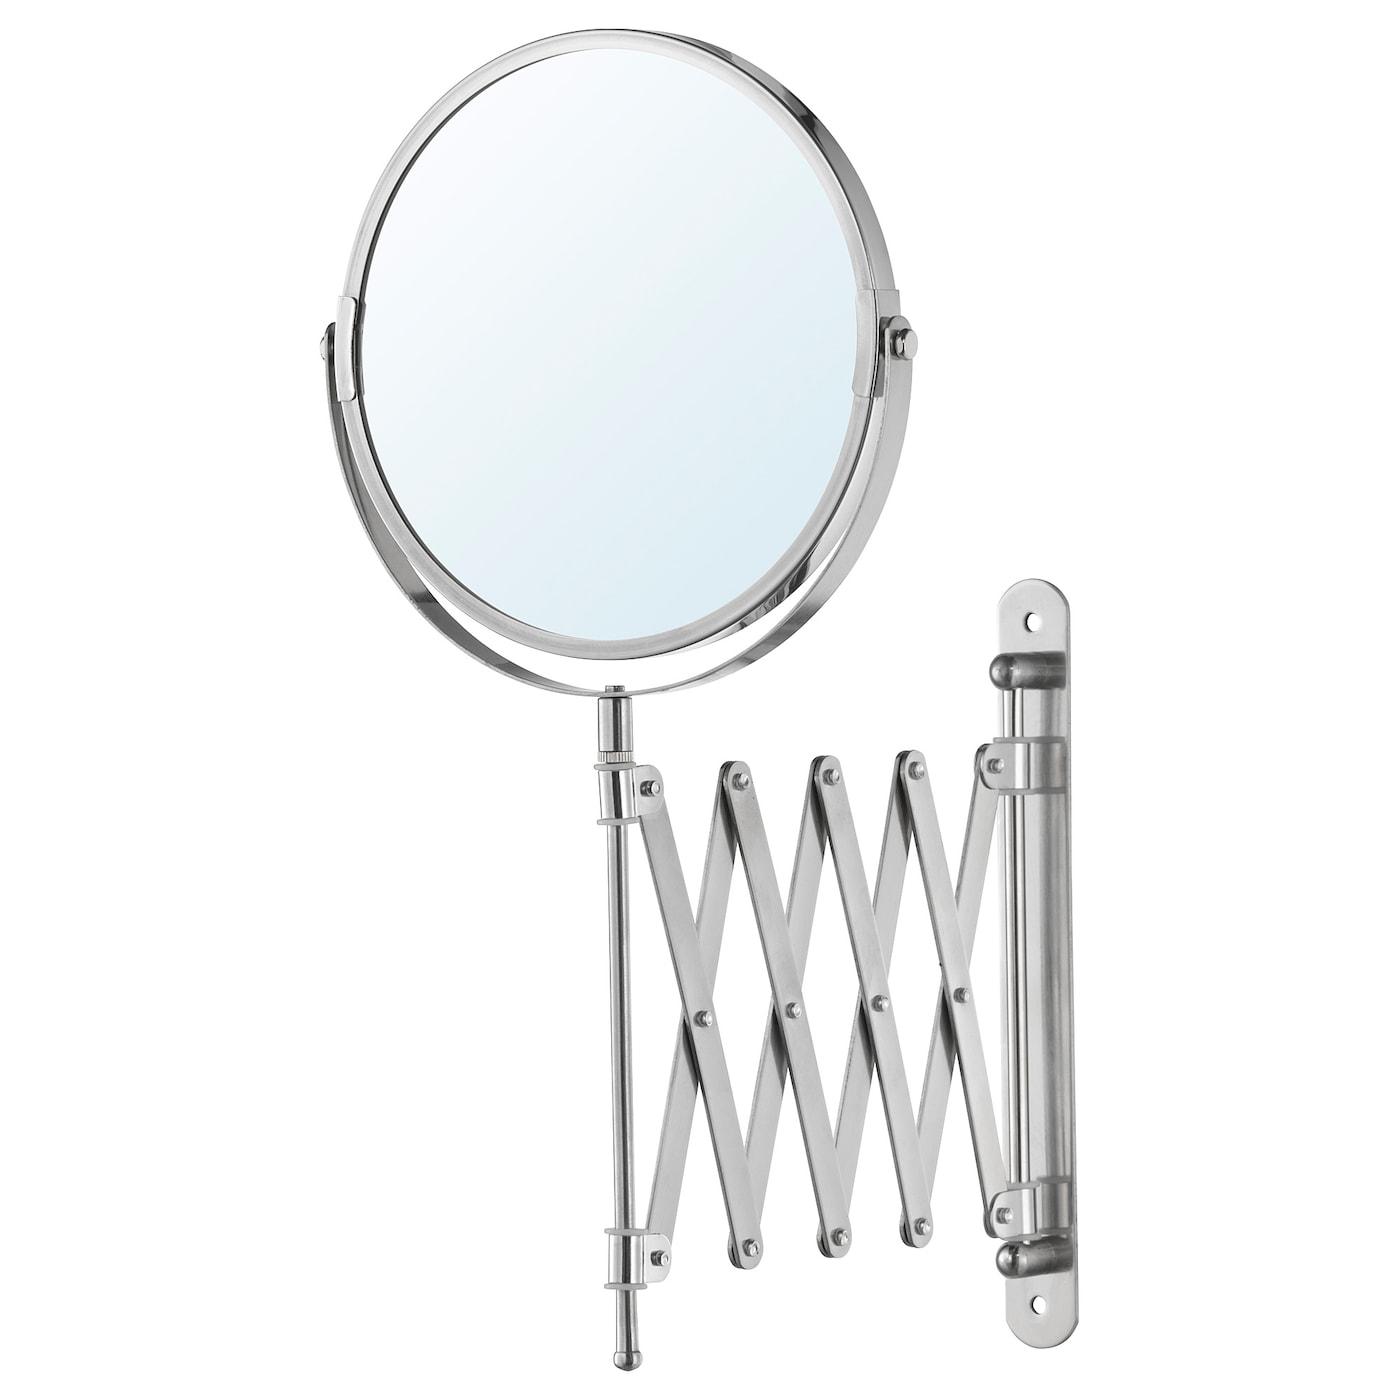 IKEA FRACK Wall Mount Bath Bathroom Magnifying Mirror Stainless Steel